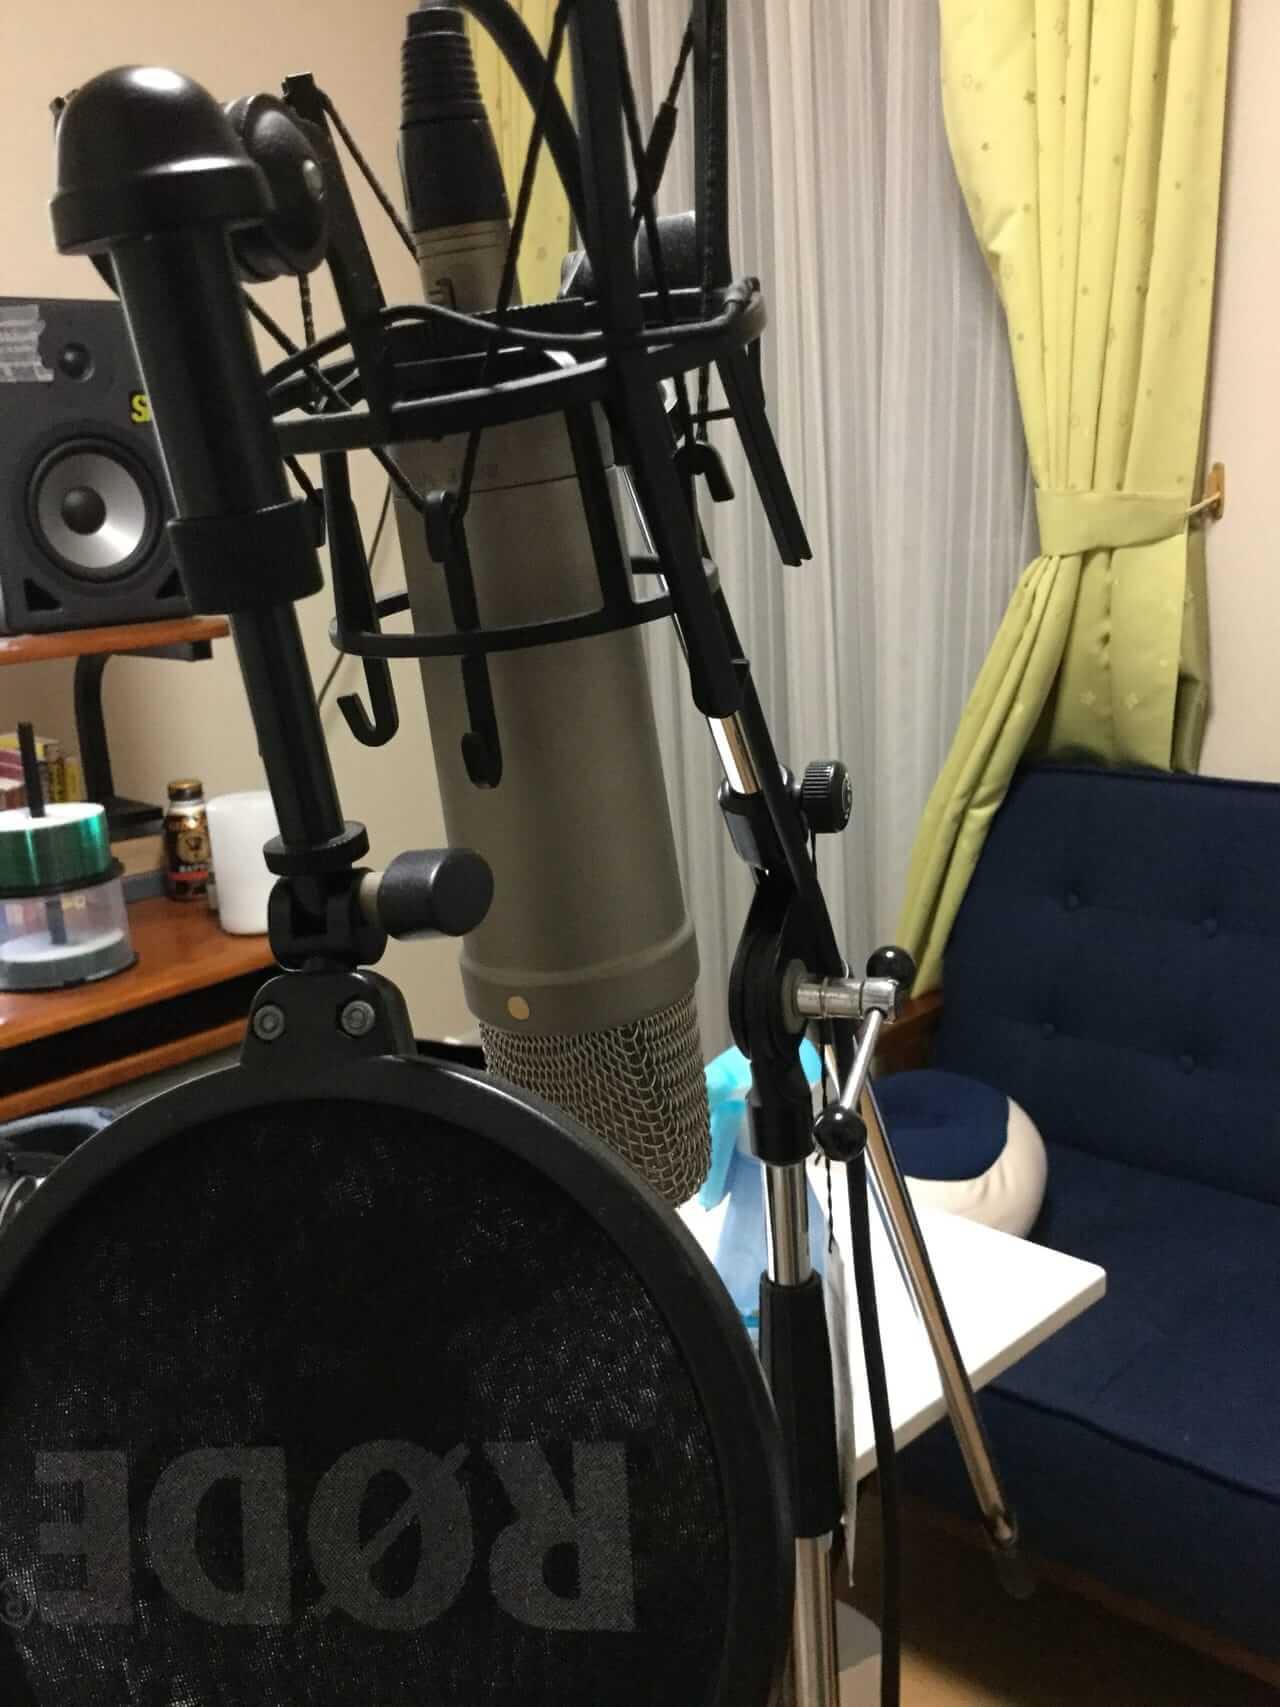 【IYOW 】 dodo in da 10goqstudio ― プロデューサー / ビートメイカーとしてのdodo